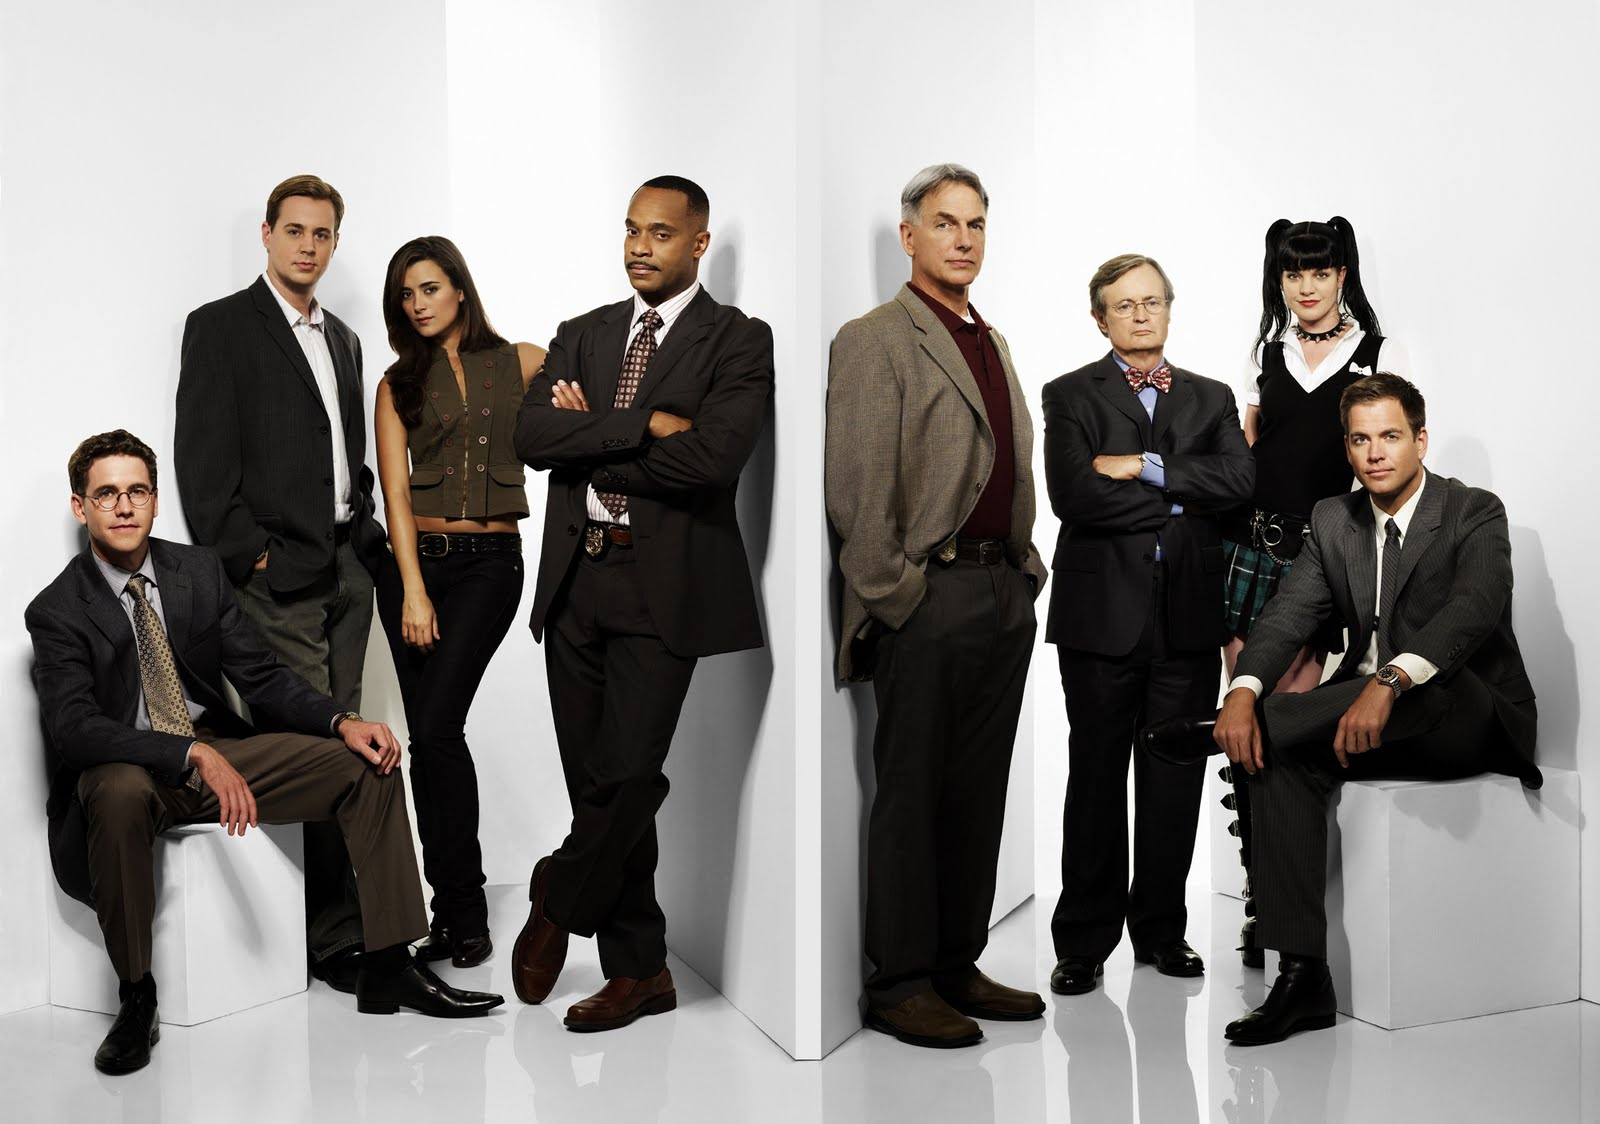 NCIS Cast Members